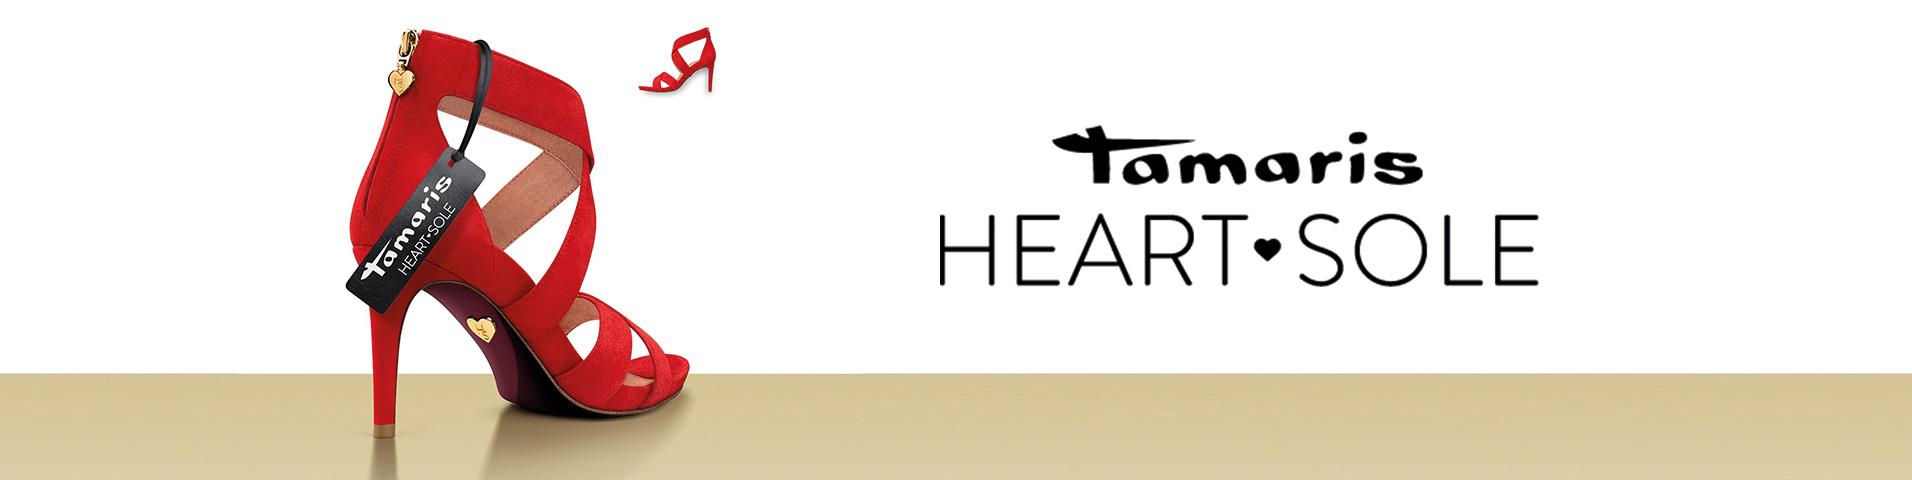 Beste heiß-verkaufende Mode Wie findet man Tamaris Heart & Sole Women's Shoes Sale | Sandals & Heels ...